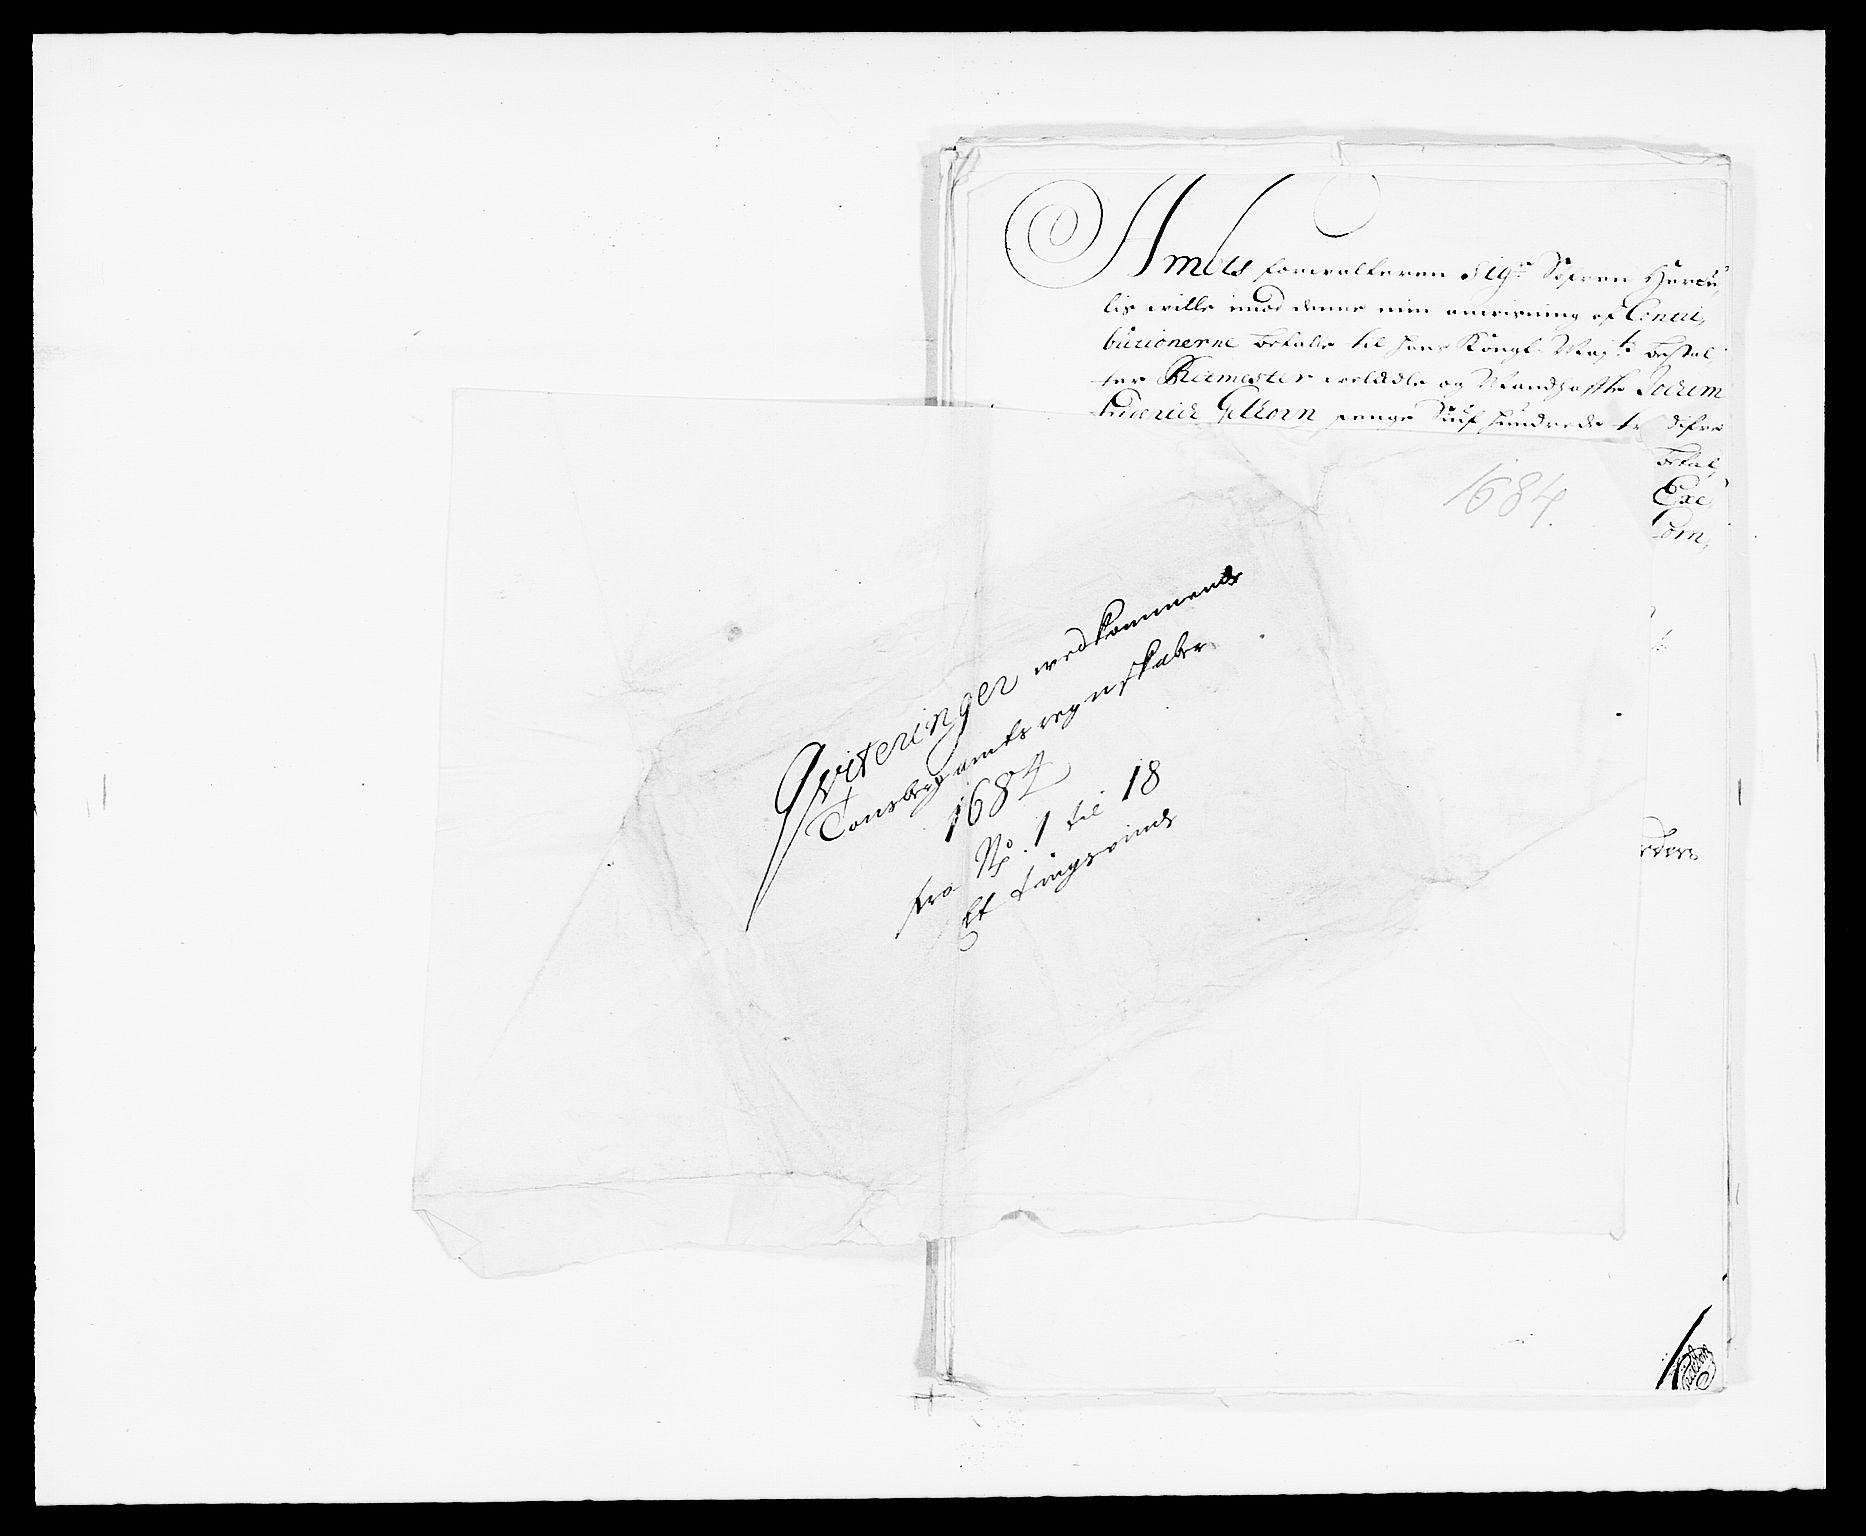 RA, Rentekammeret inntil 1814, Reviderte regnskaper, Fogderegnskap, R32/L1855: Fogderegnskap Jarlsberg grevskap, 1684, s. 163